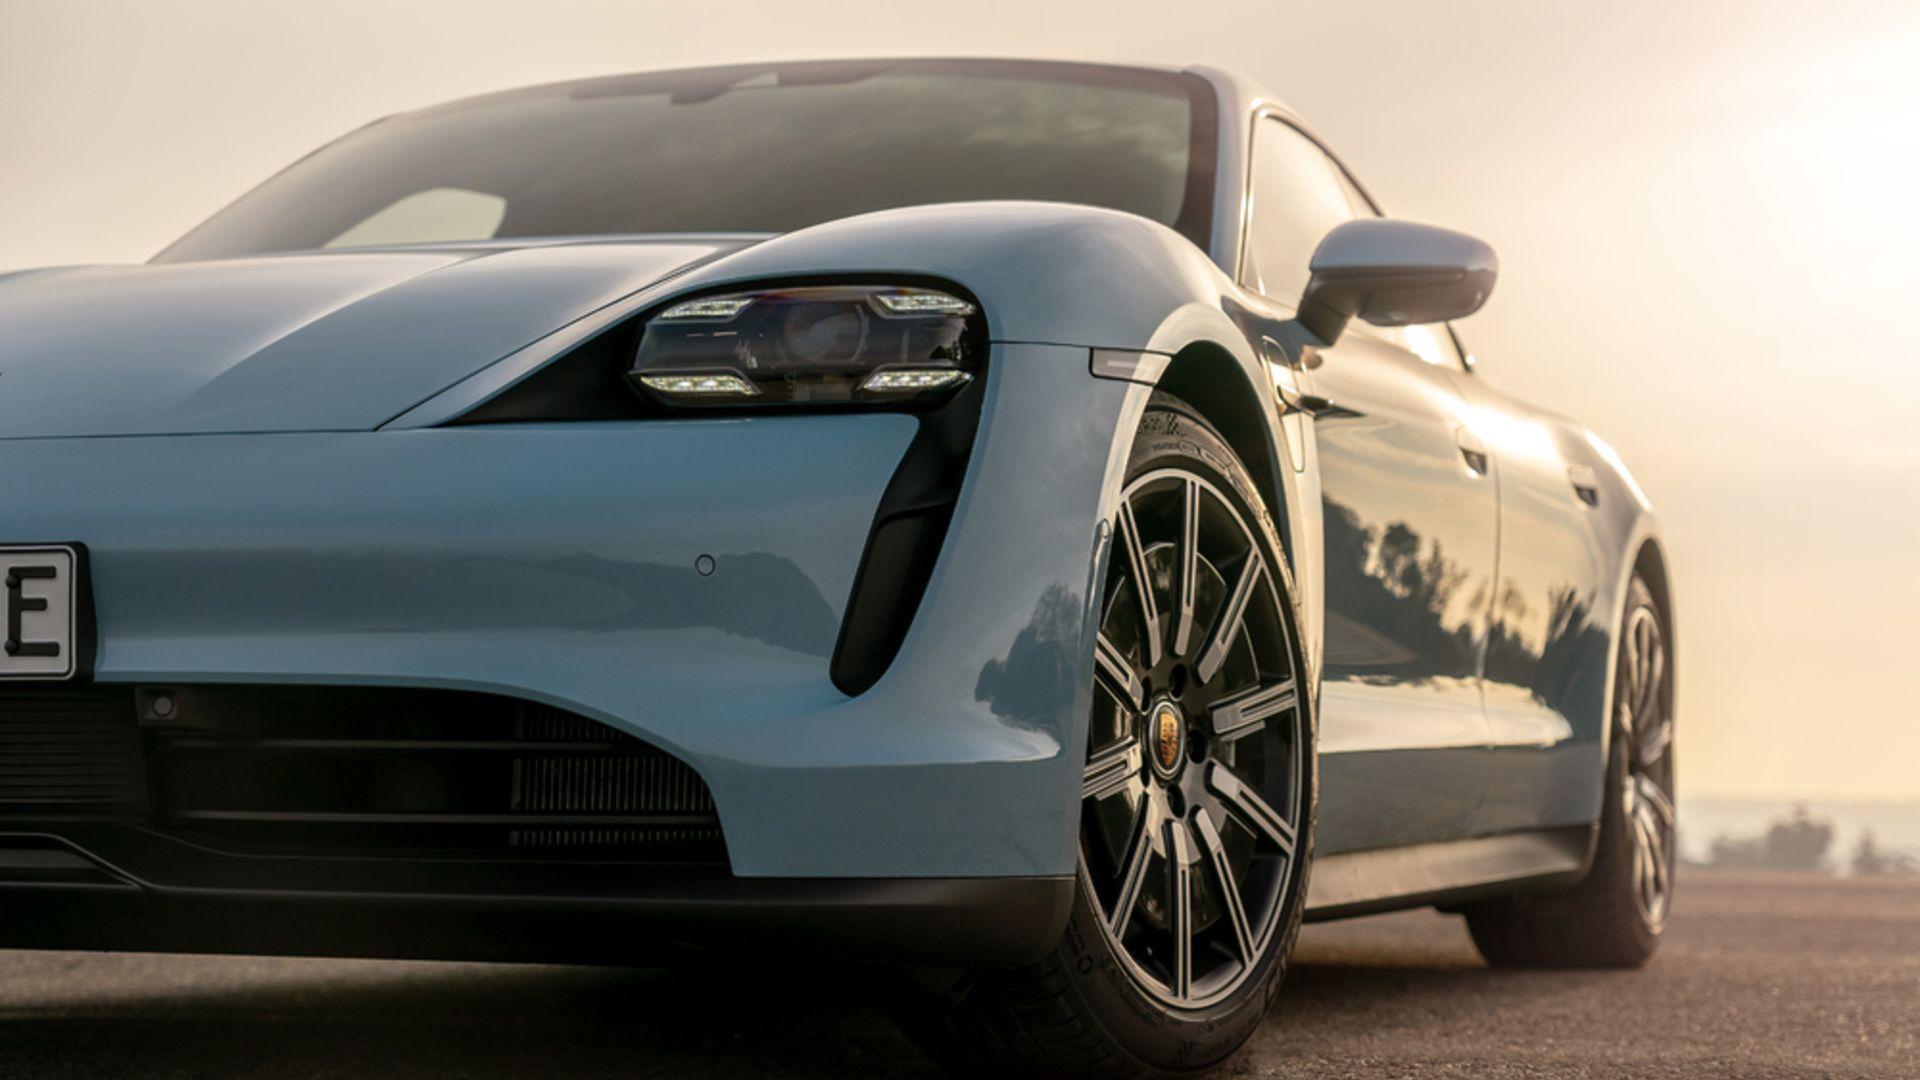 The secrets of car polishing – tip 2